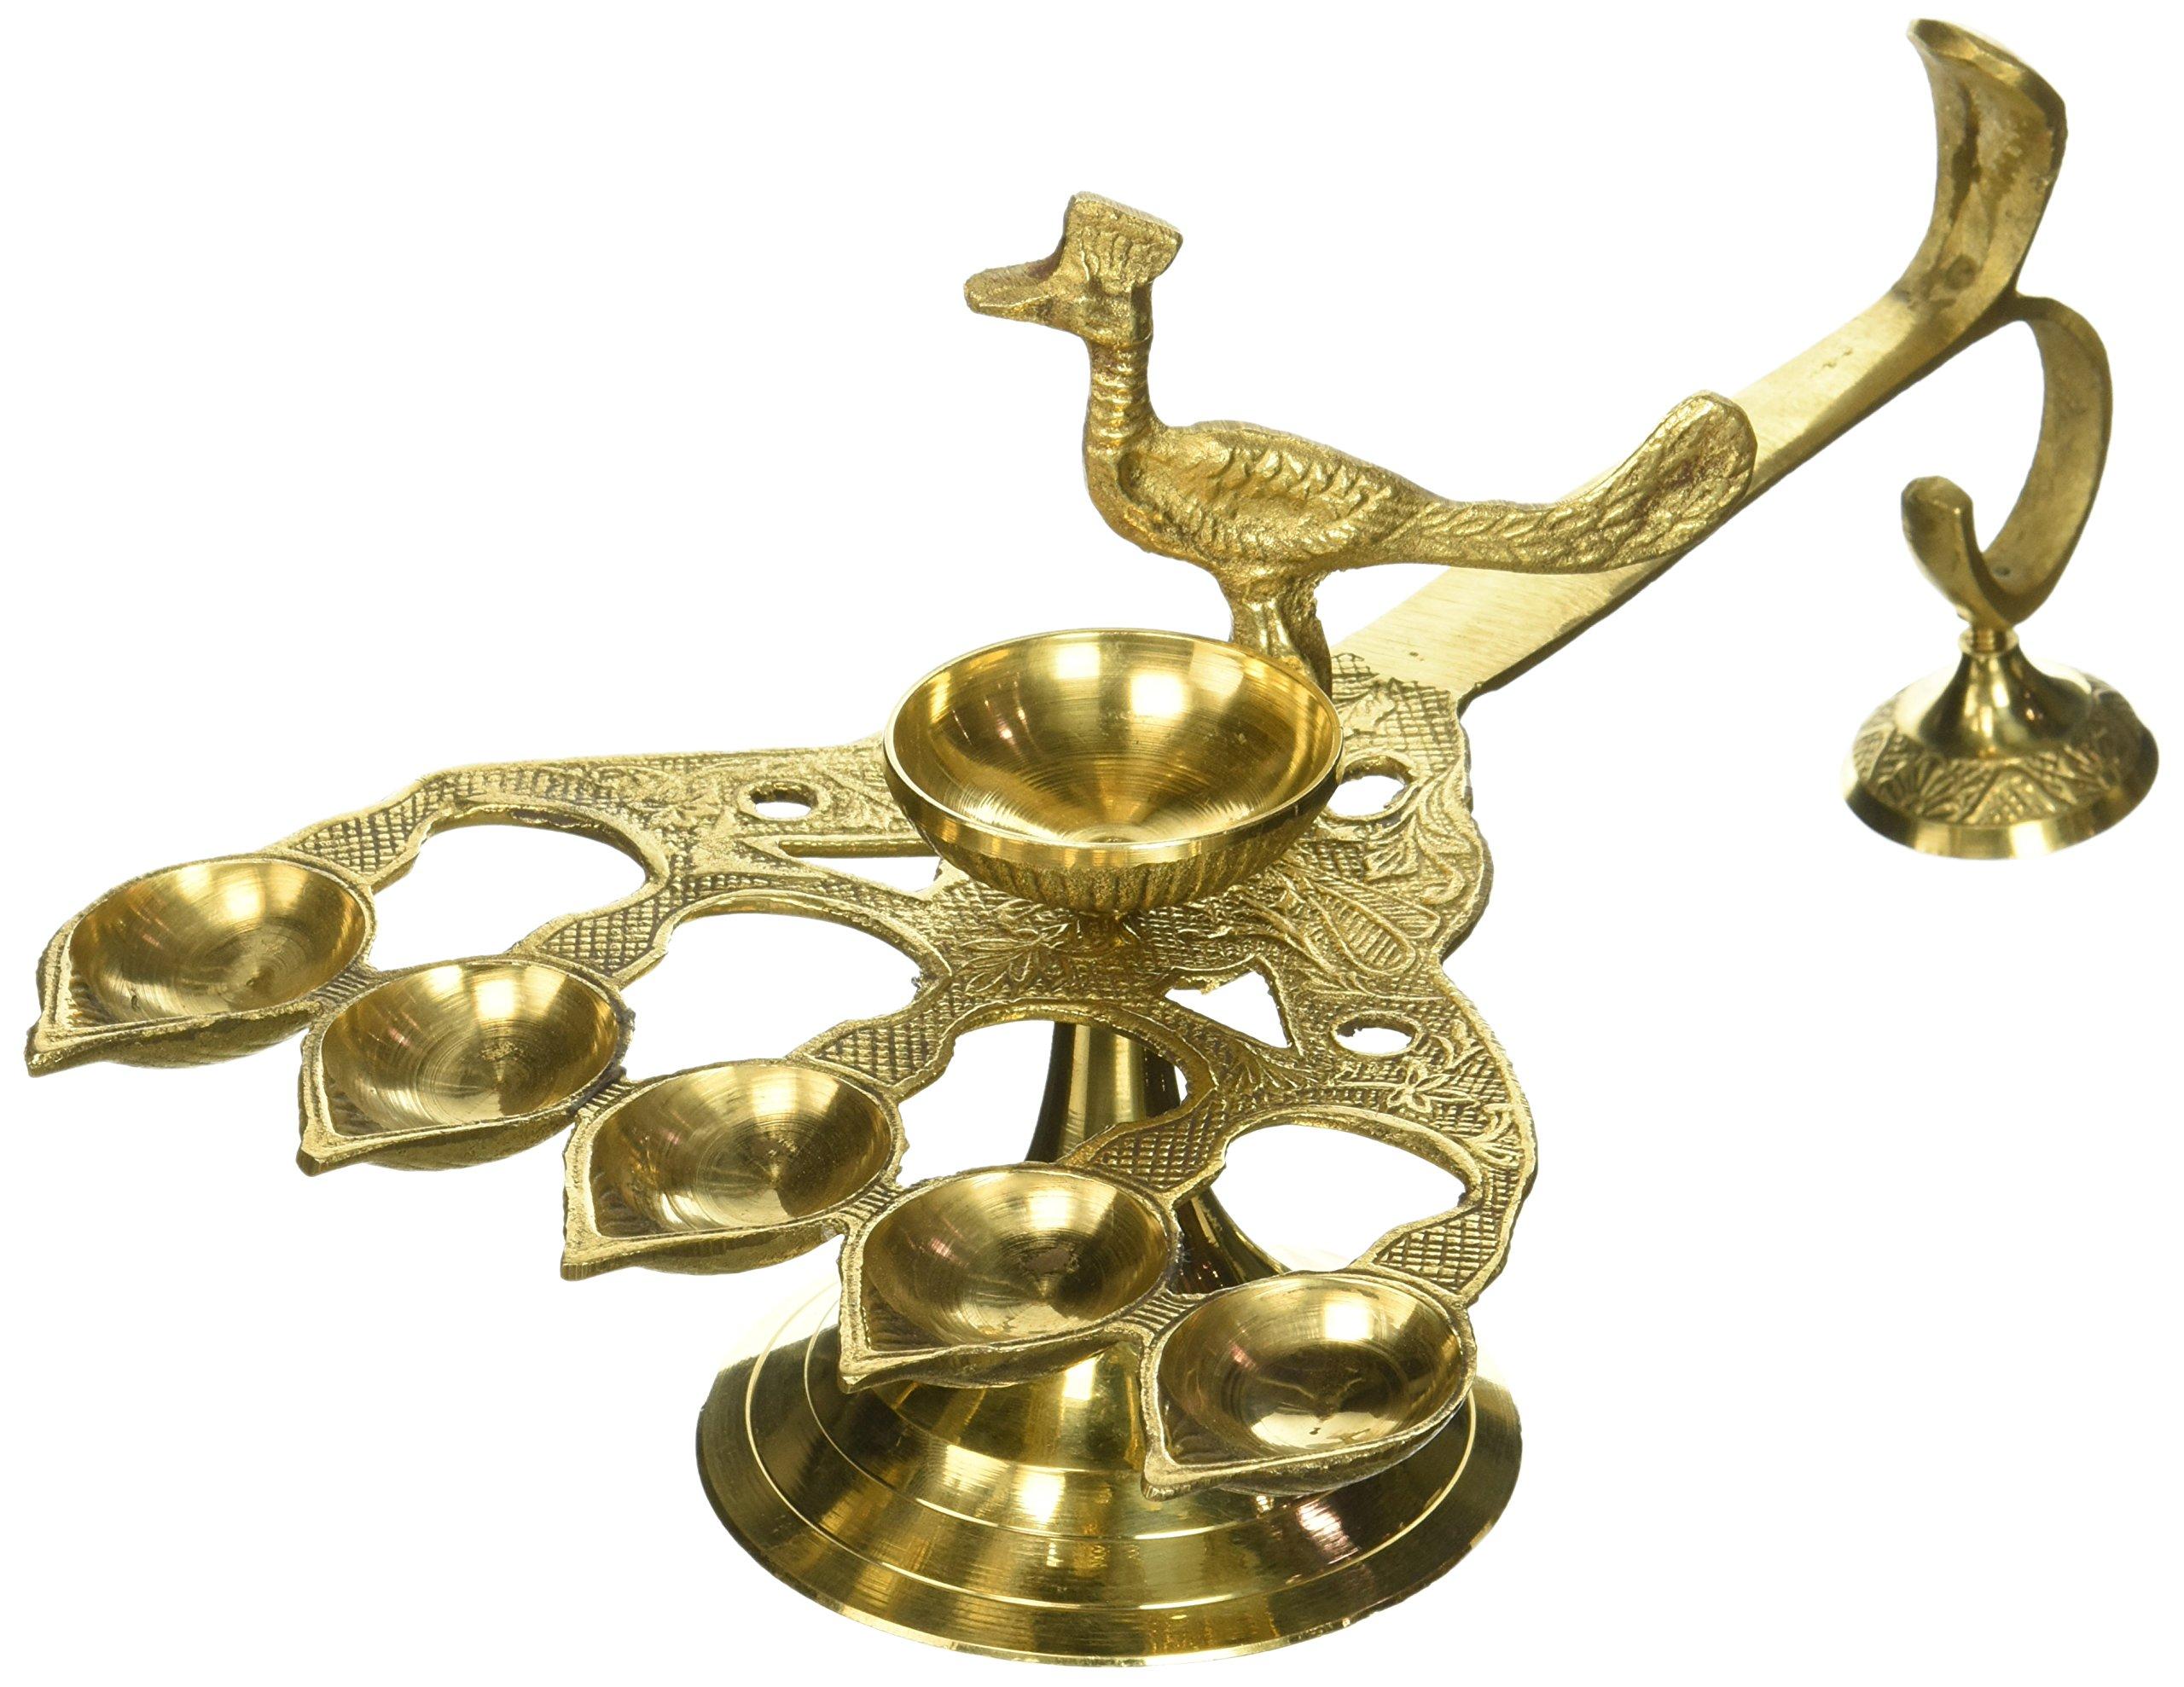 Hand-held Peacock Panch Diya - Brass